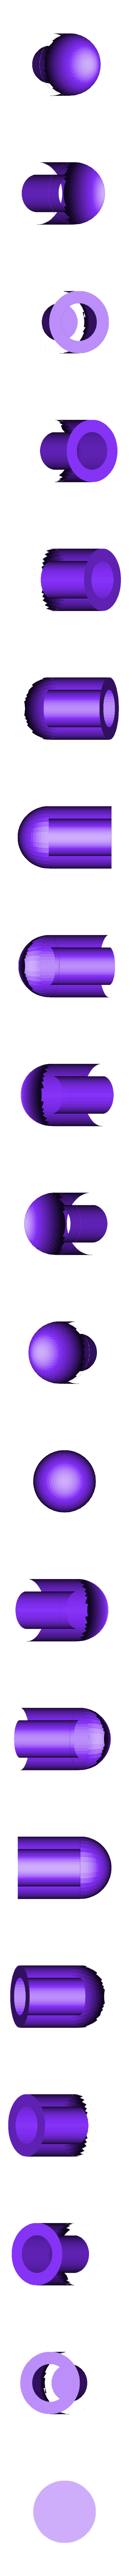 trx_27mhz_radio_antenna_cap.stl Download free STL file Traxxas 1/16 Chassis Mod • 3D printable design, Gophy